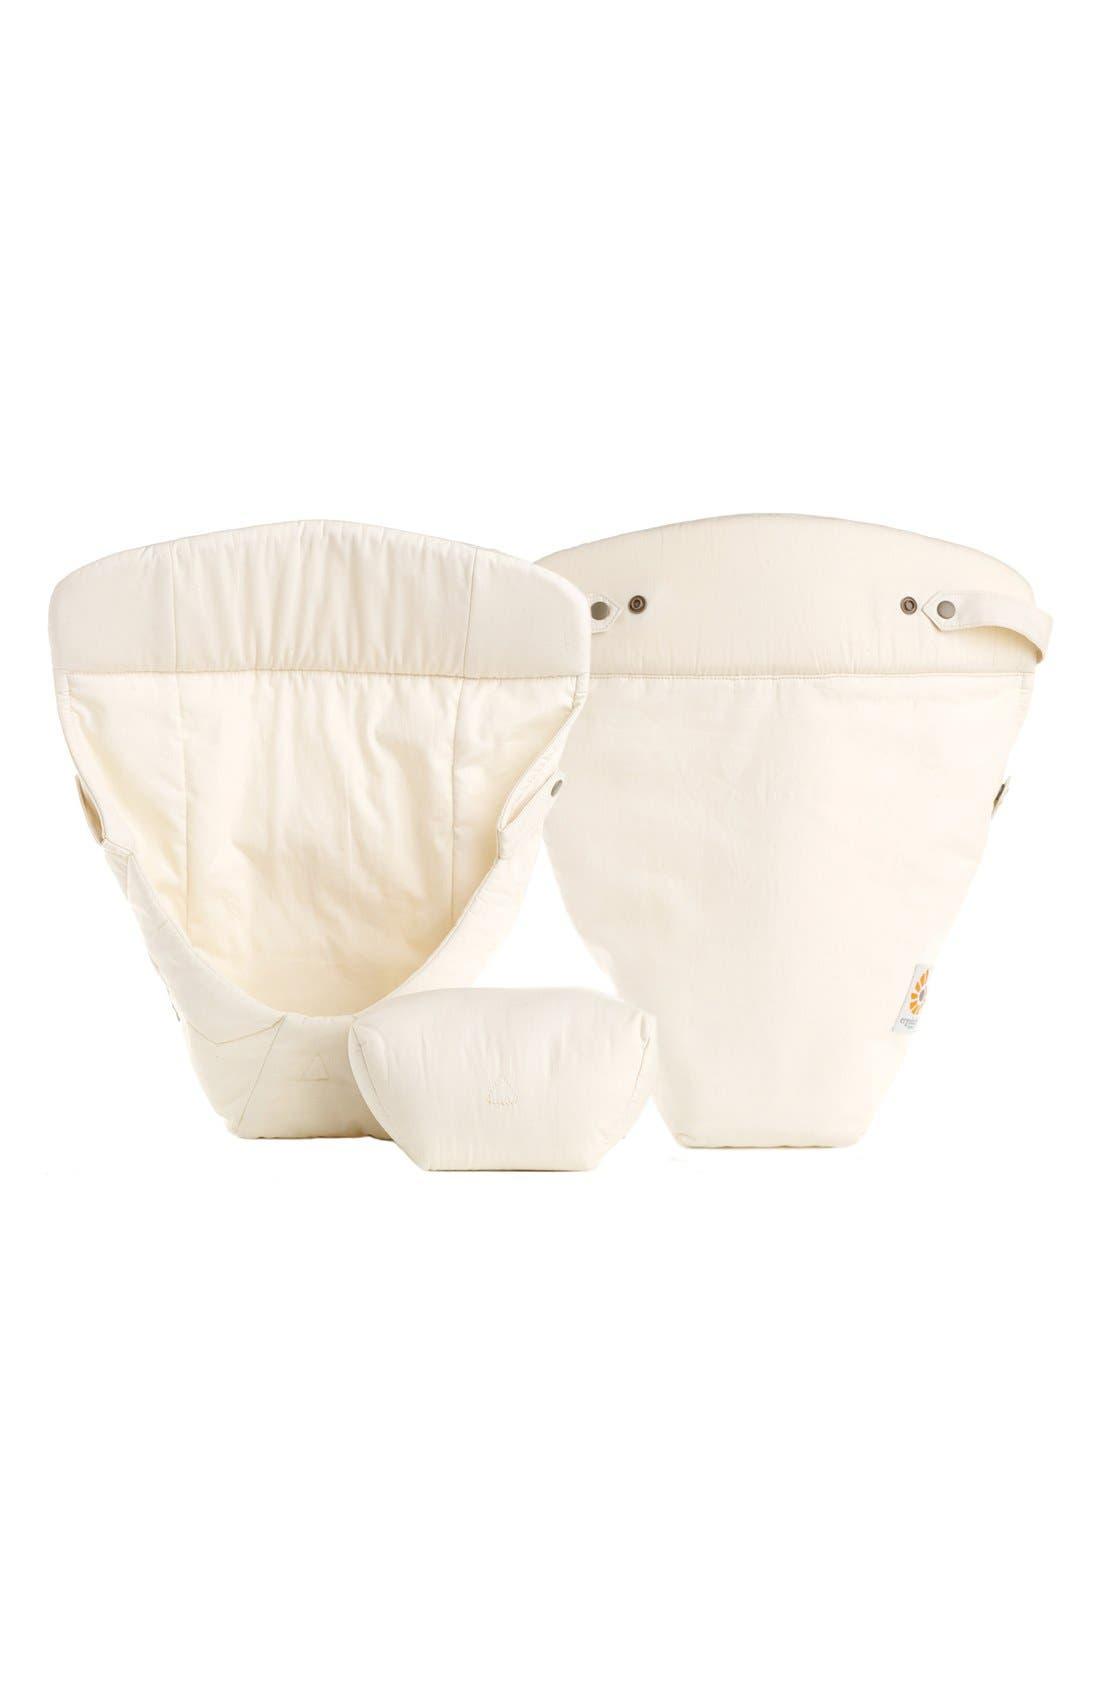 ERGObaby 'Easy Snug' Organic Cotton Baby Insert